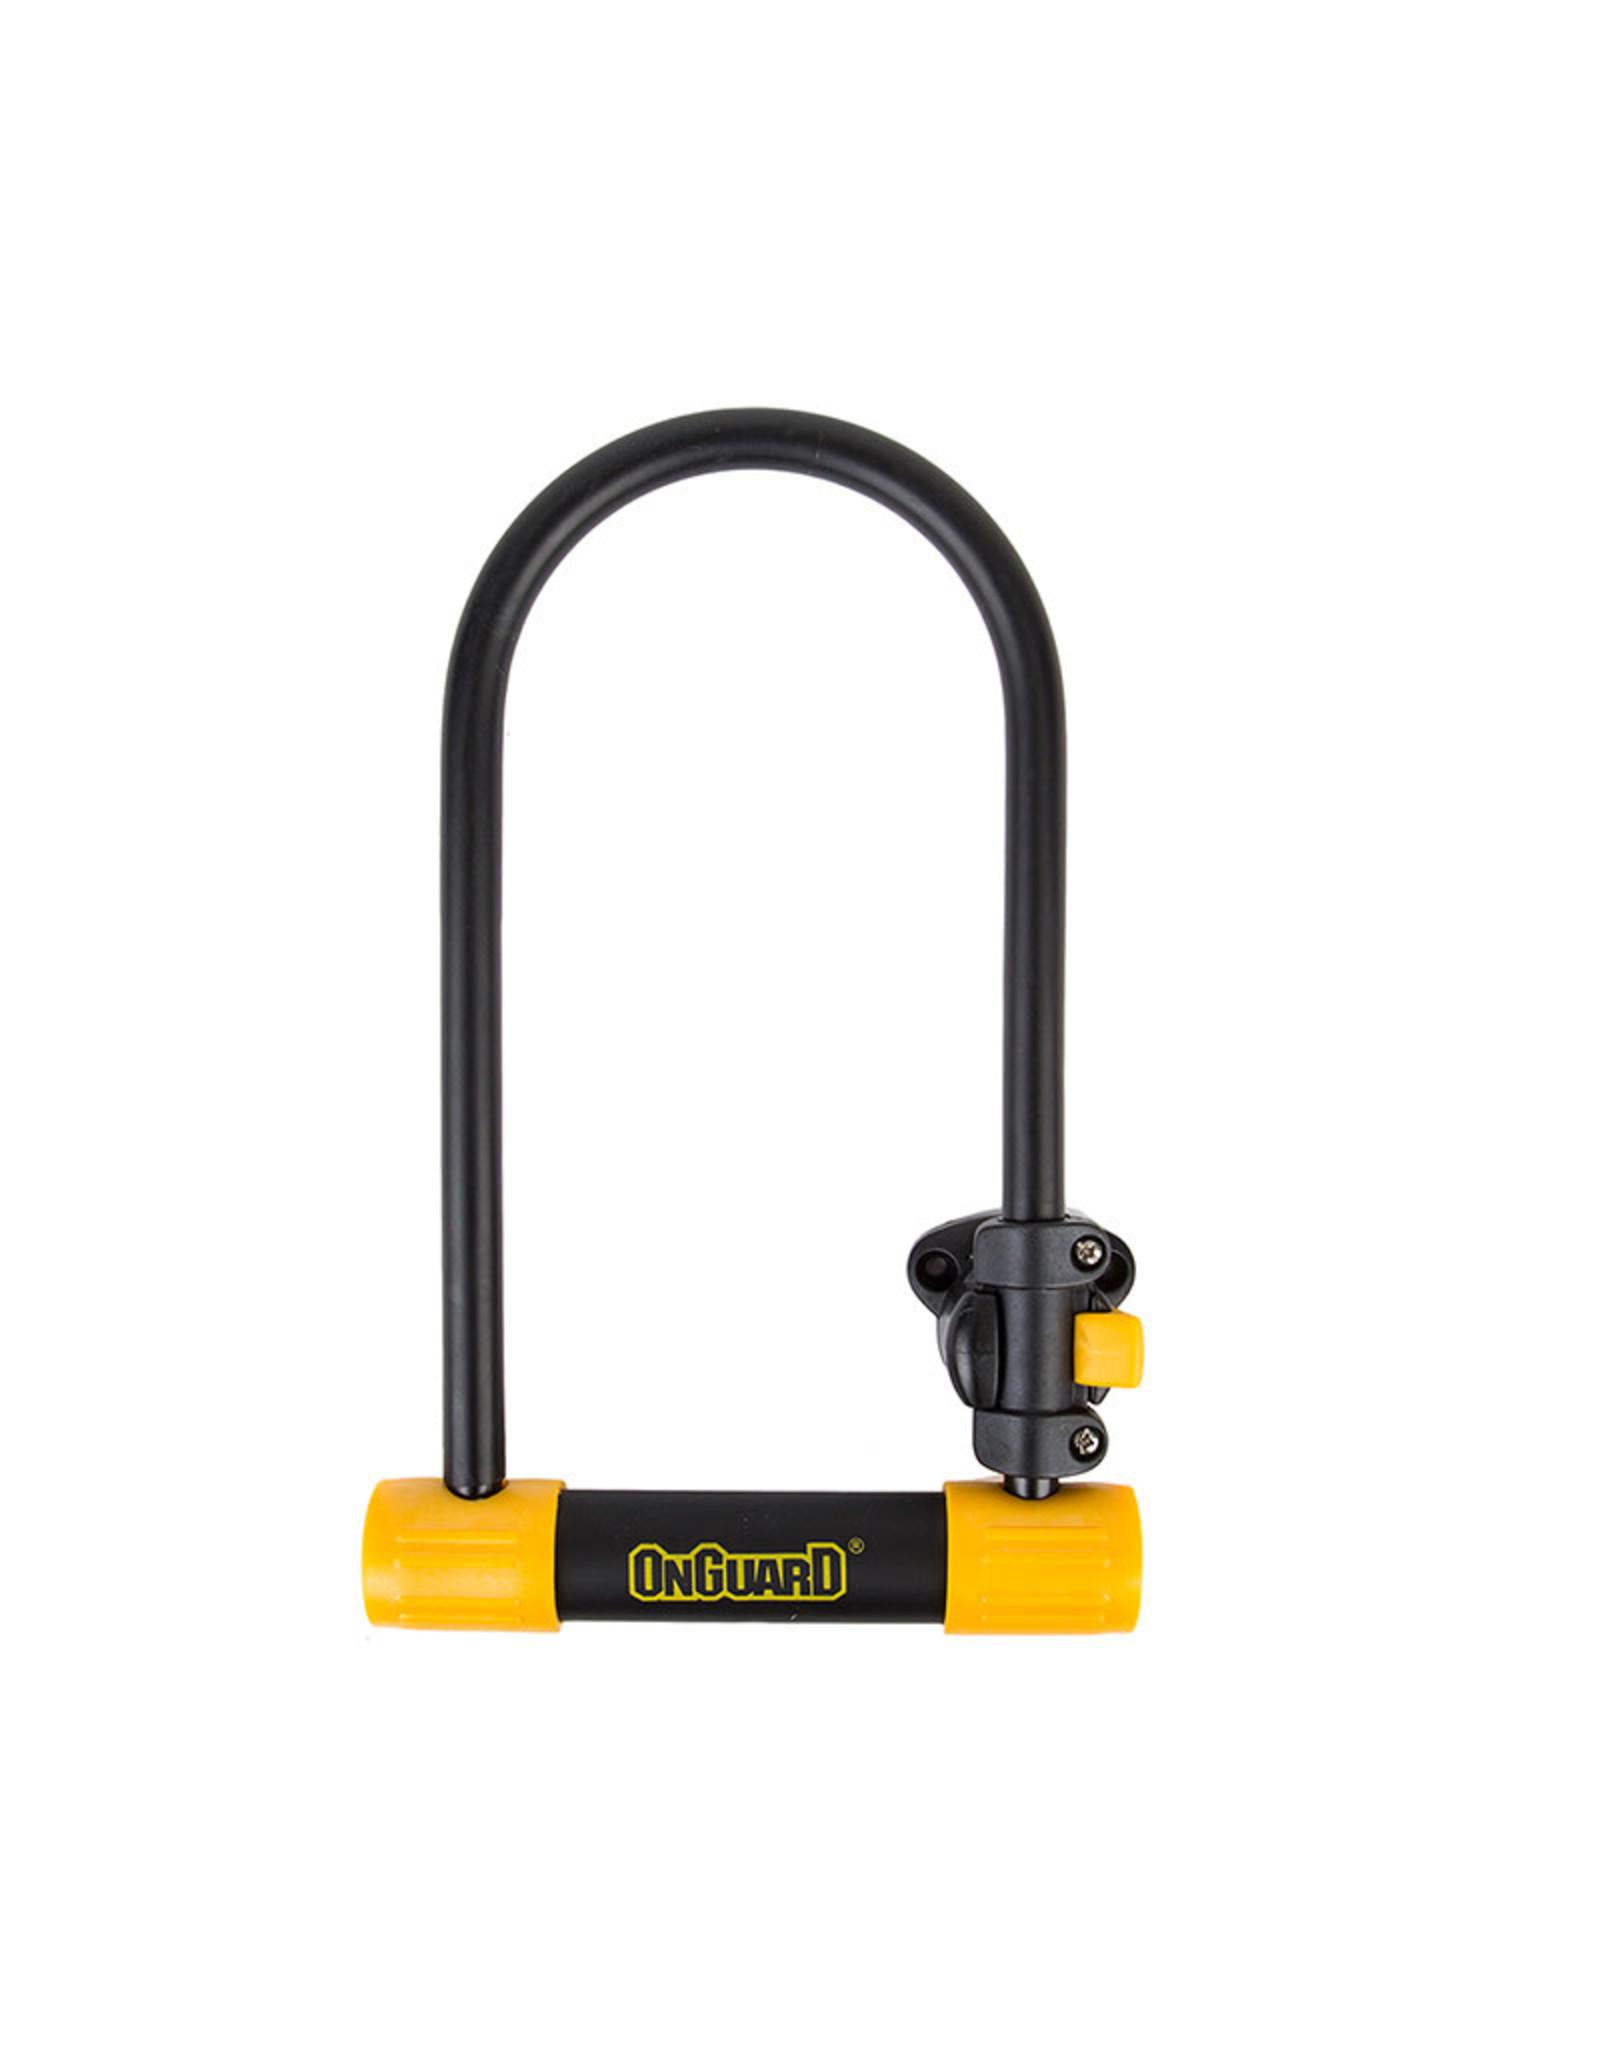 ONGUARD OnGuard Bulldog U-Lock 8010, 4.5x9, Black